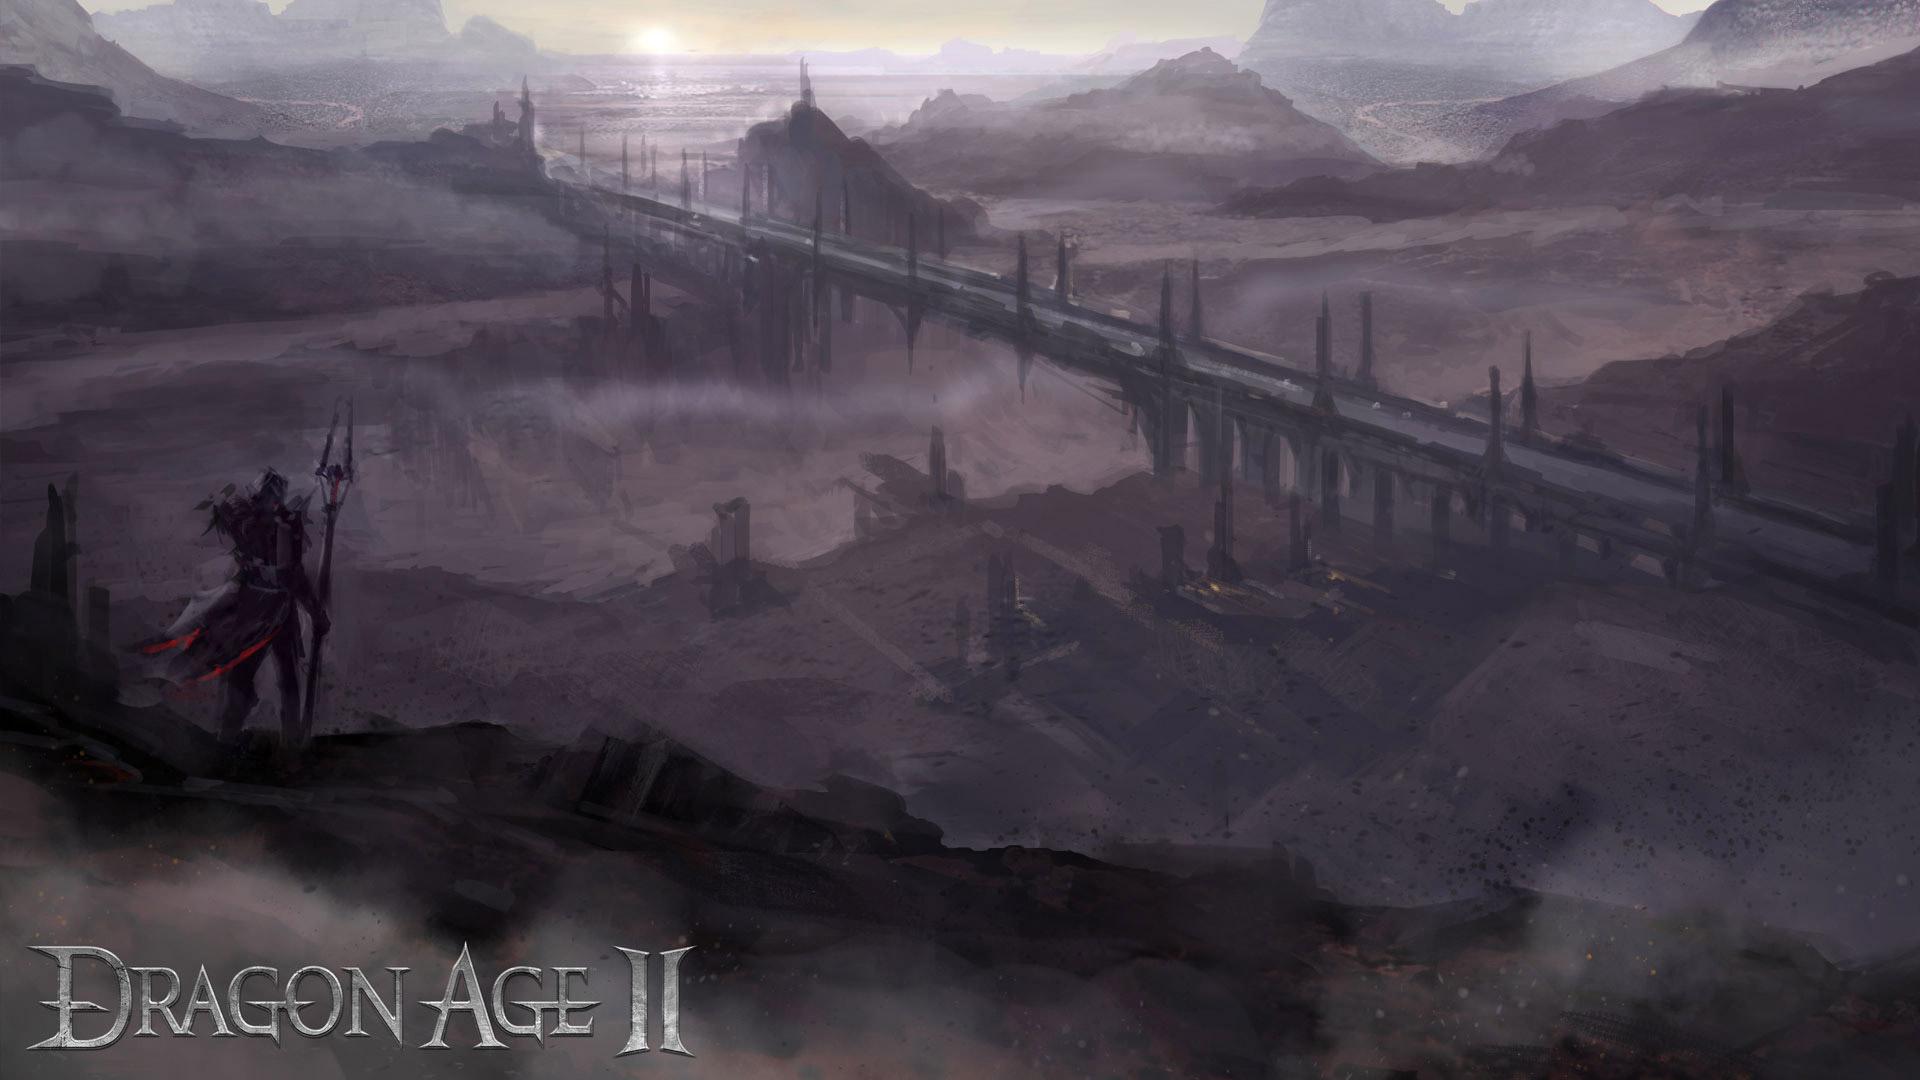 Free Dragon Age 2 Wallpaper in 1920x1080